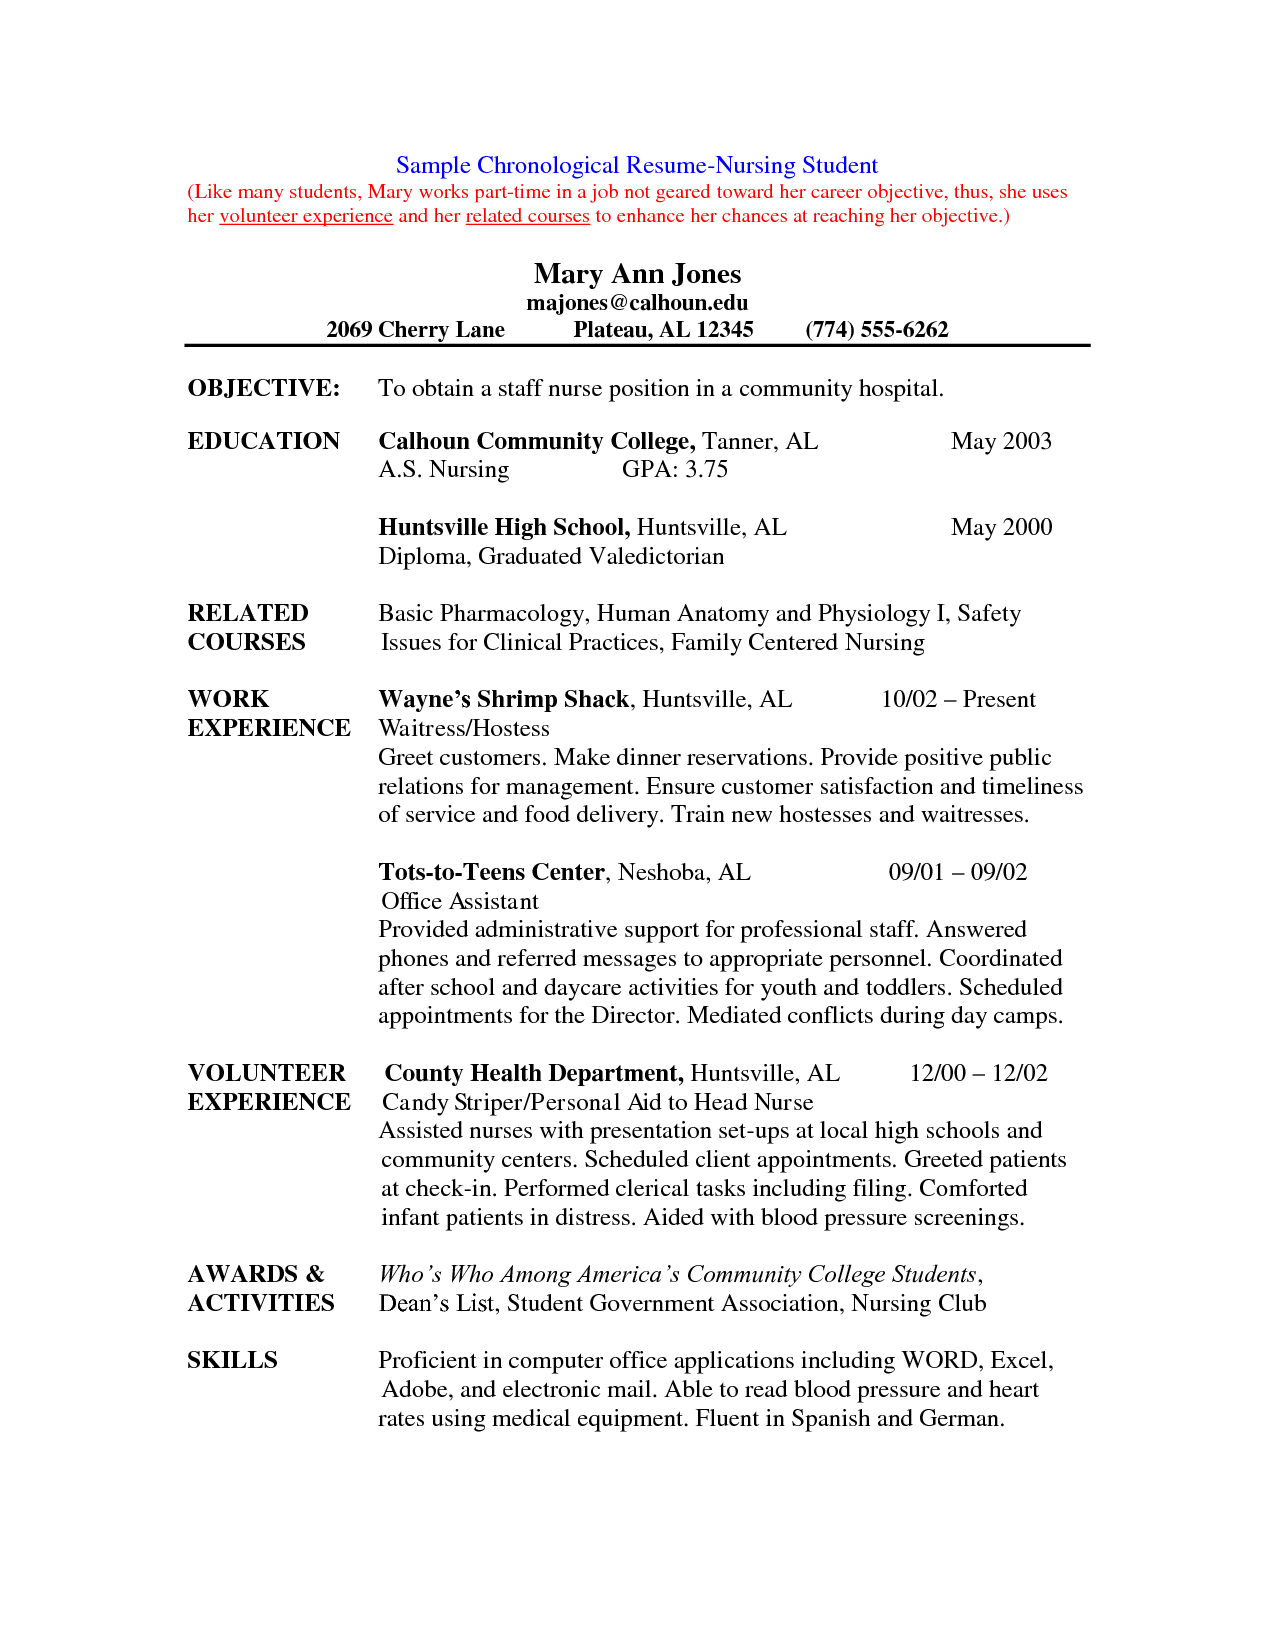 Nursing Student Resume Cover Letter Examples Student Nurse